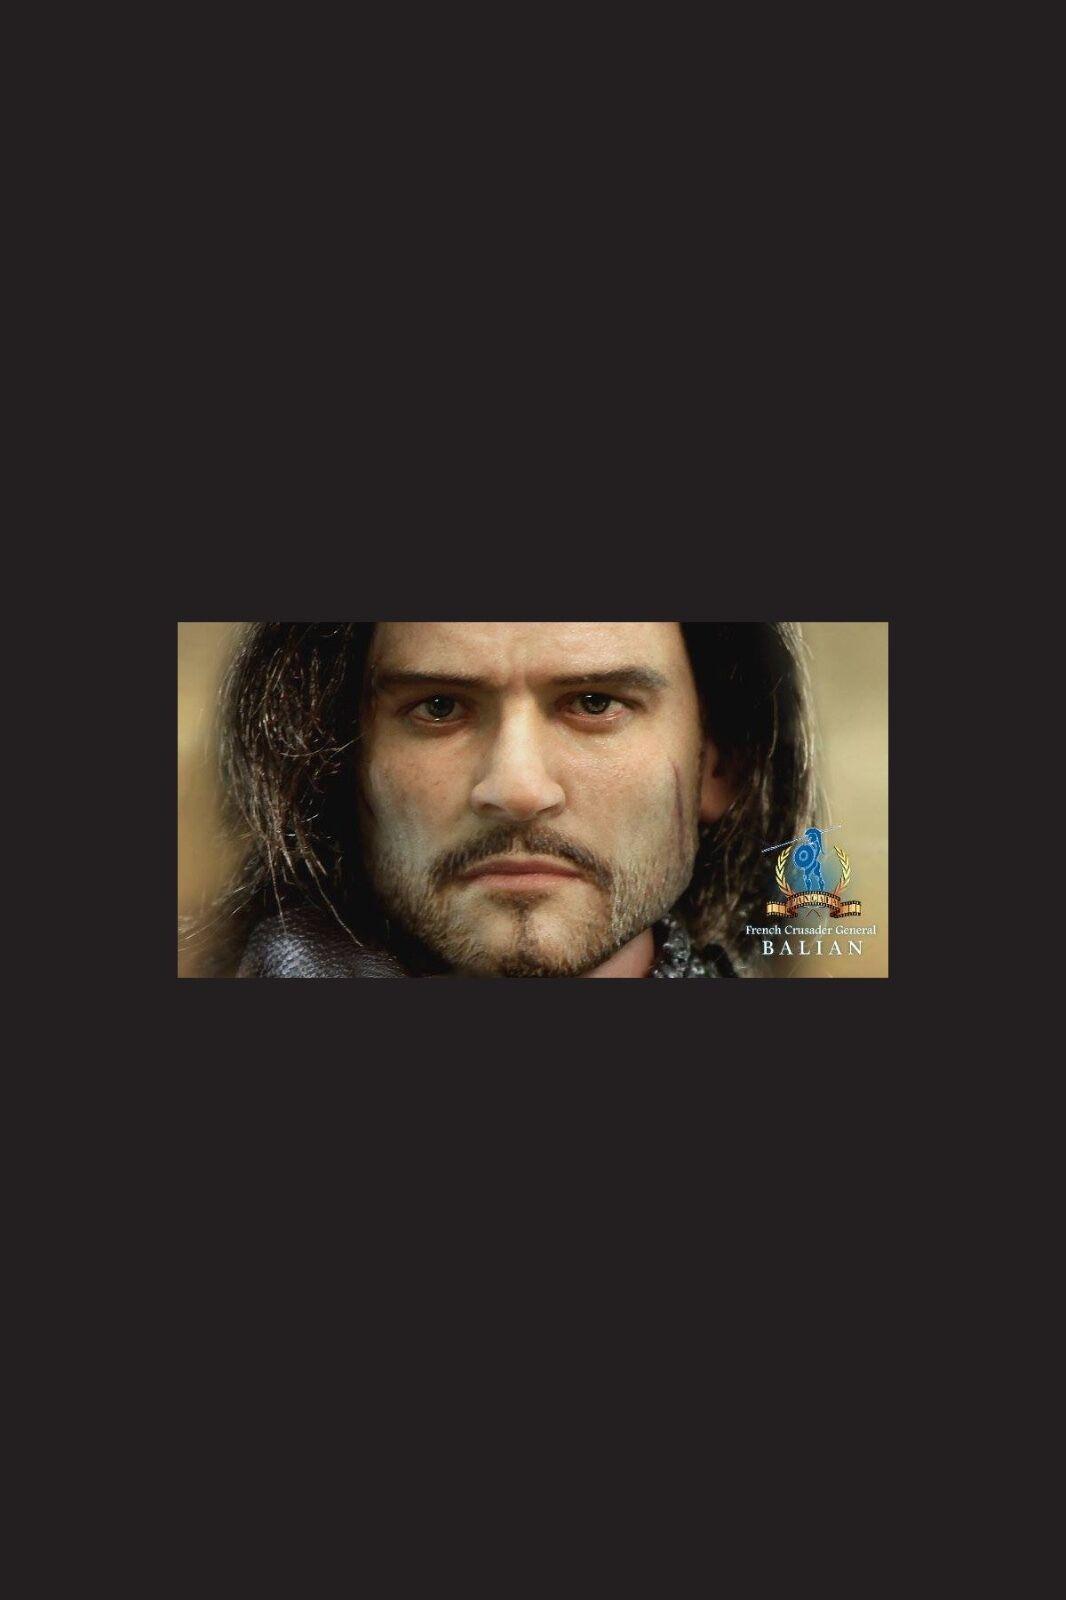 Aci knight pangaea french balian did action figure kaustic roman 1 6 12'' dragon